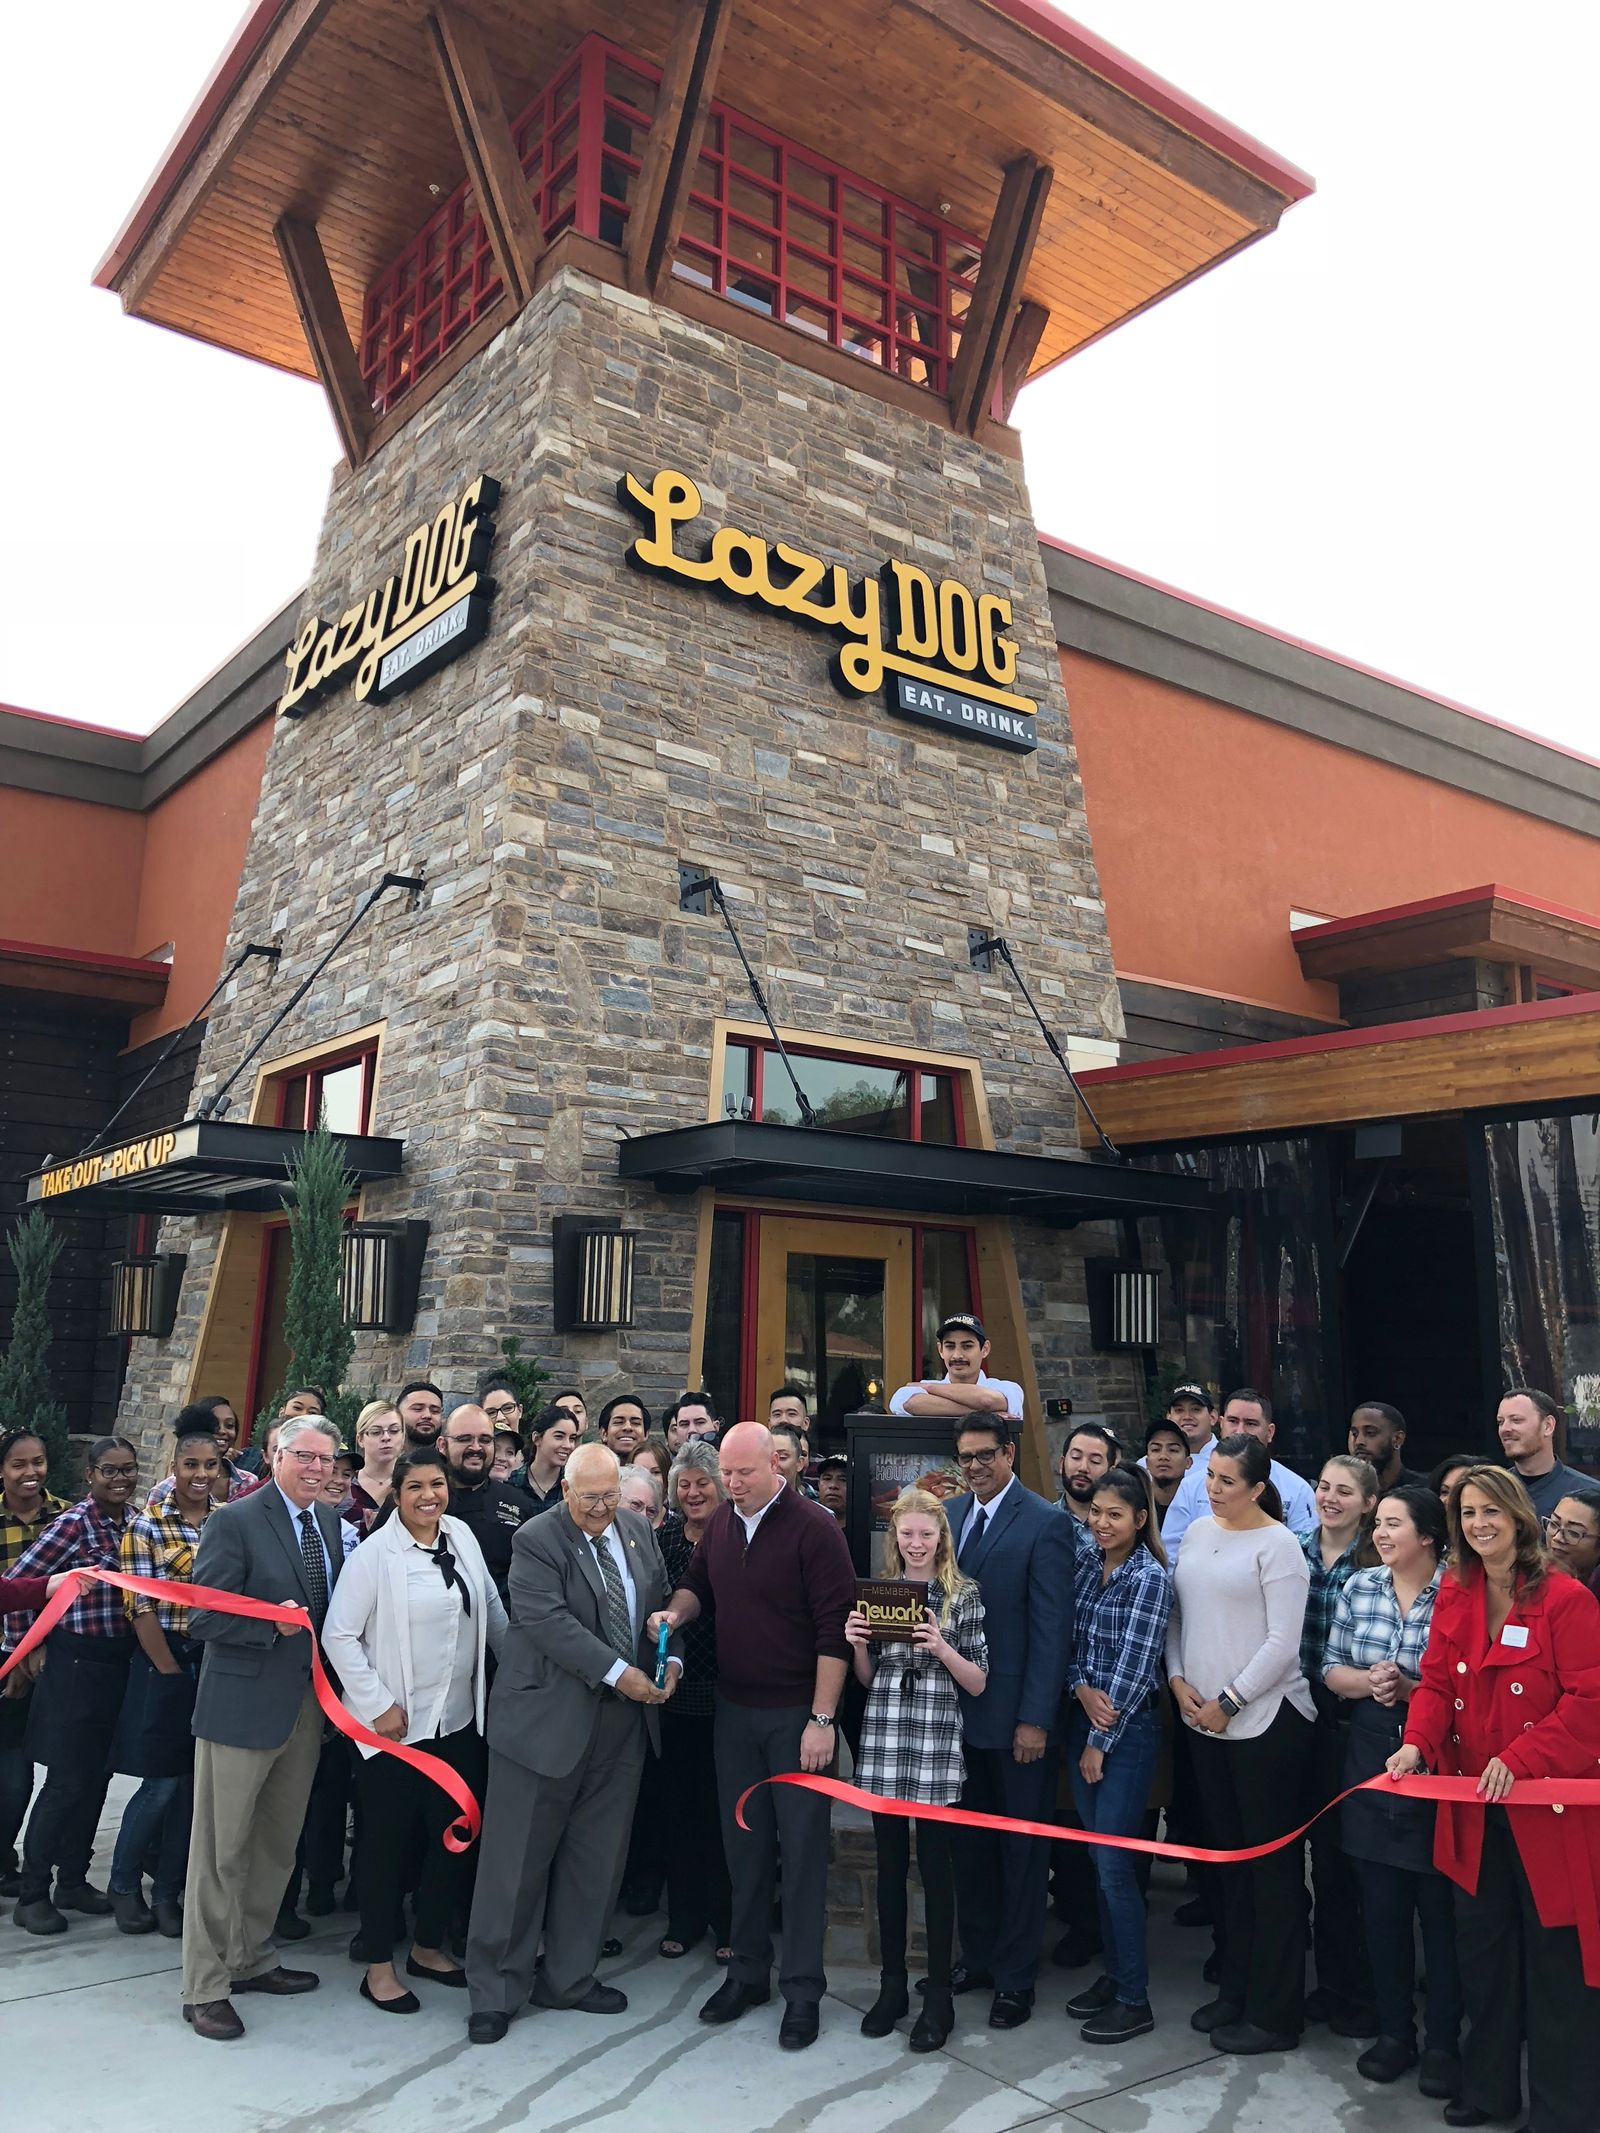 Lazy Dog Restaurant & Bar Opens in Newark, CA